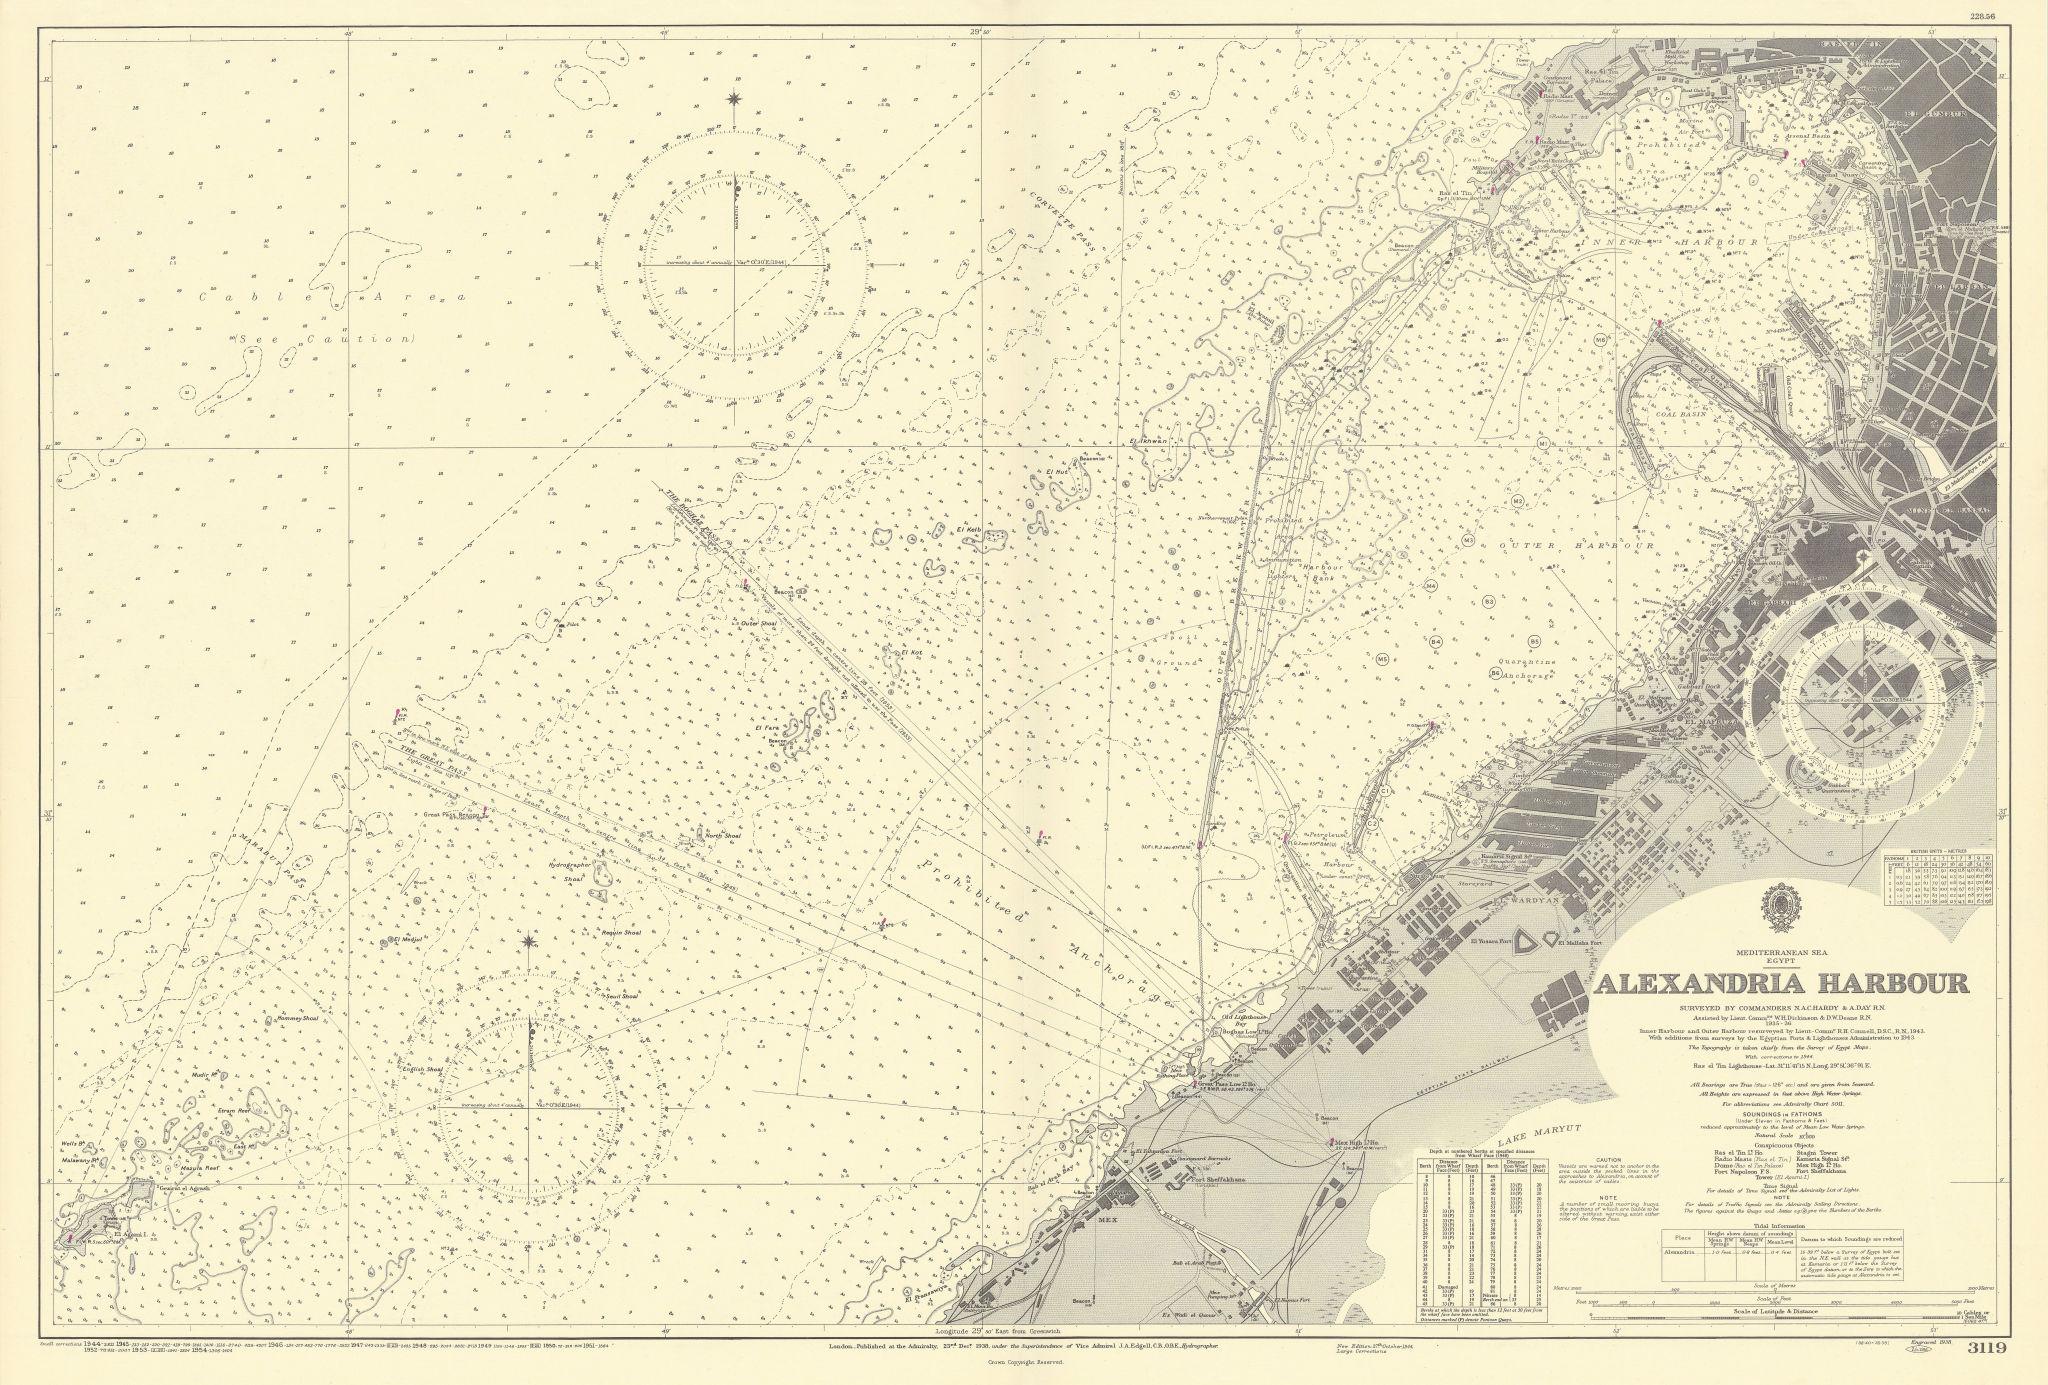 Alexandria harbour. Mediterranean Sea Egypt. ADMIRALTY sea chart 1938 (1954) map